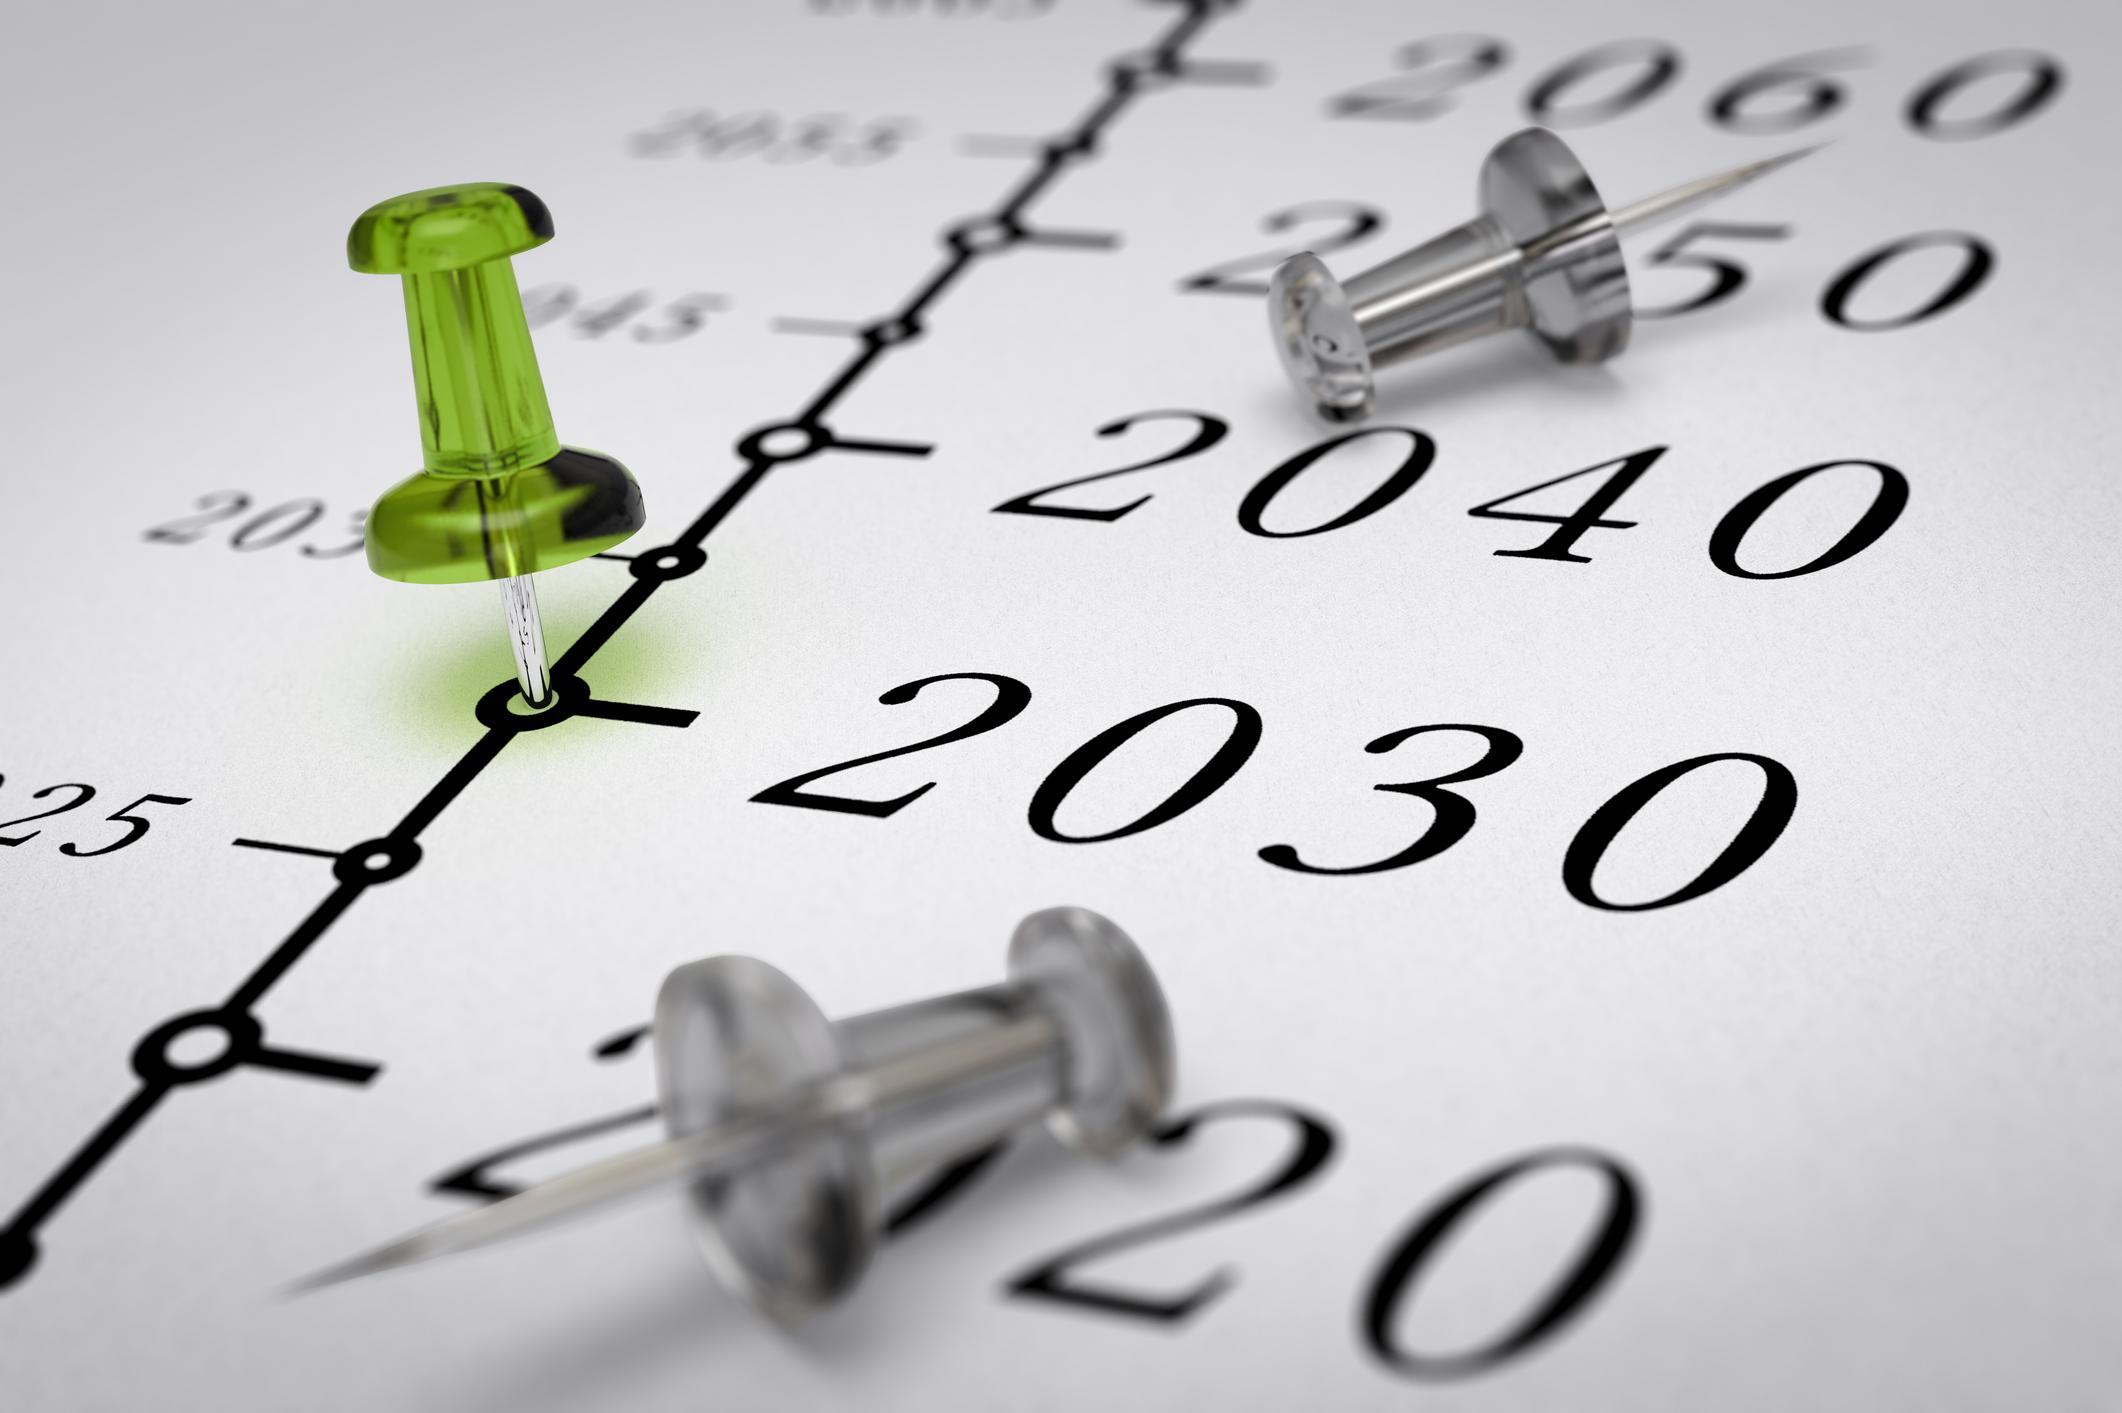 2030 pinned on timeline